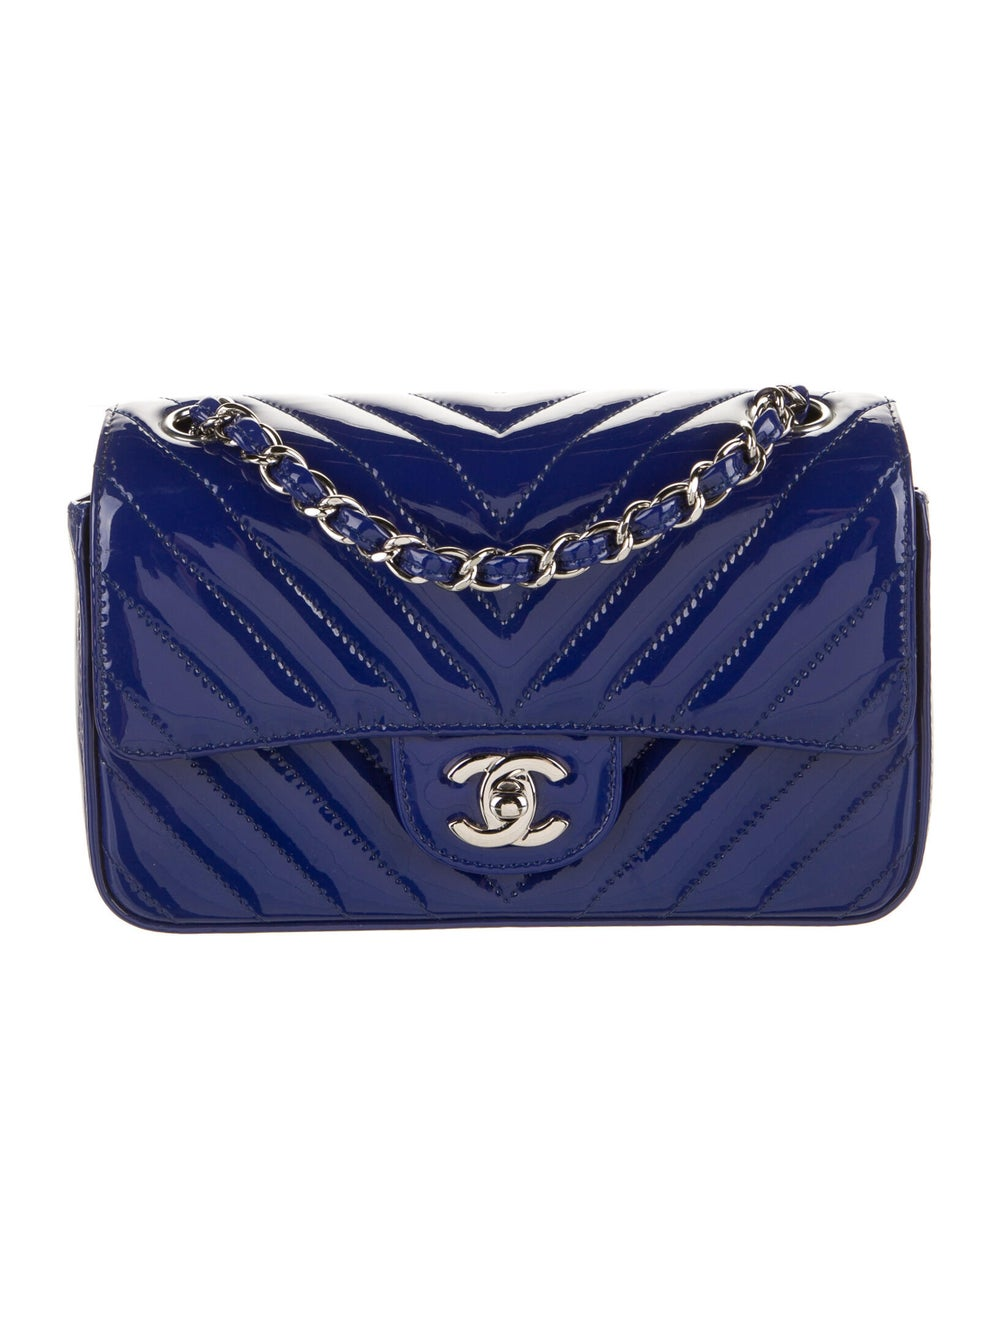 Chanel New Mini Chevron Flap Bag Blue - image 1